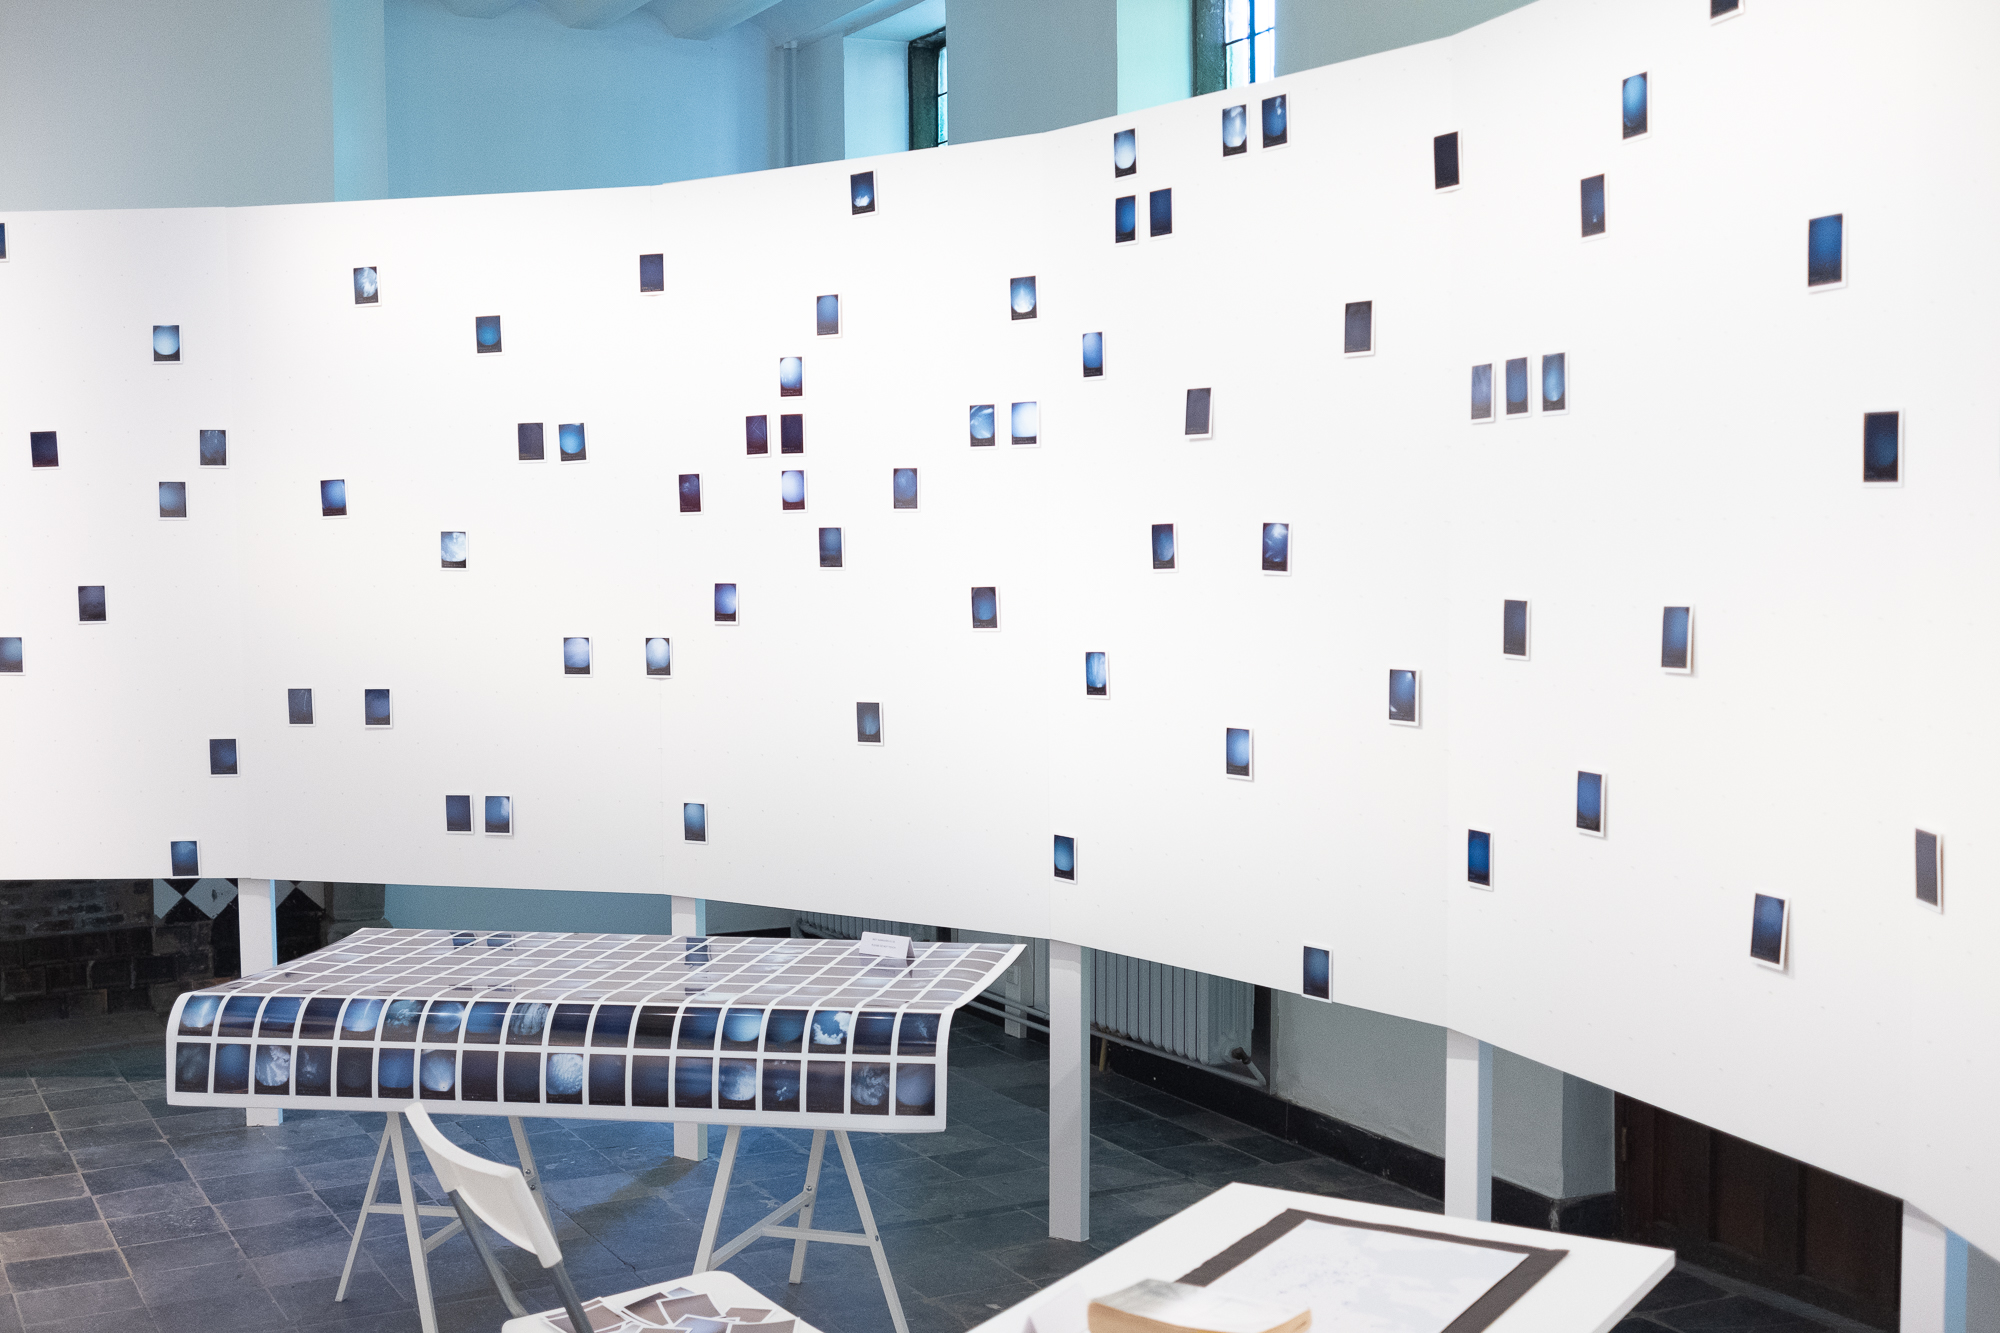 The Blue Skies Project – installatie als work-in-progress in Z33 (2018)